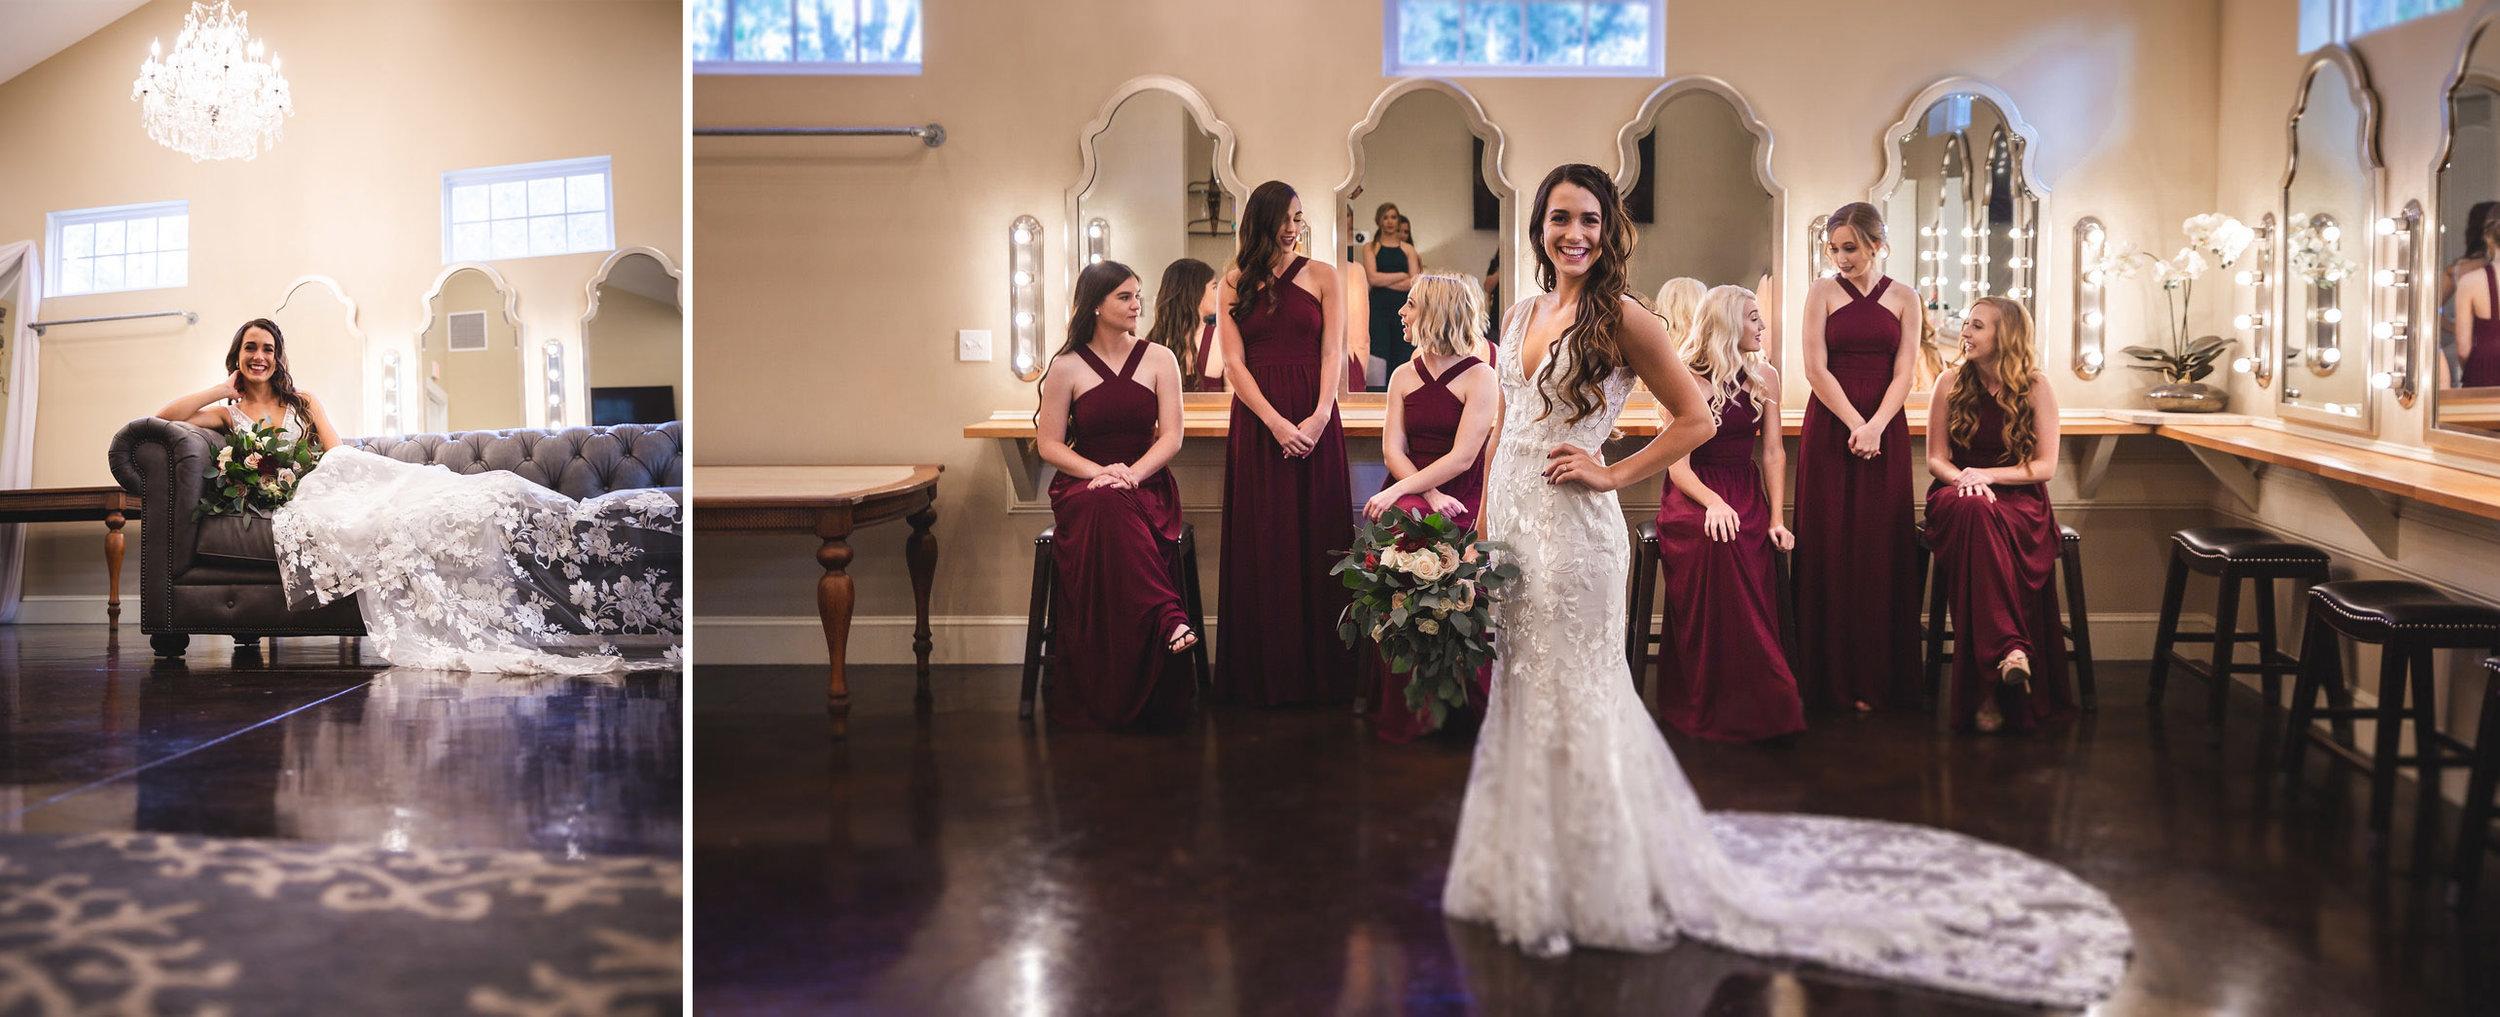 adam-szarmack-bowing-oaks-wedding-photographer-jacksonville-42.jpg